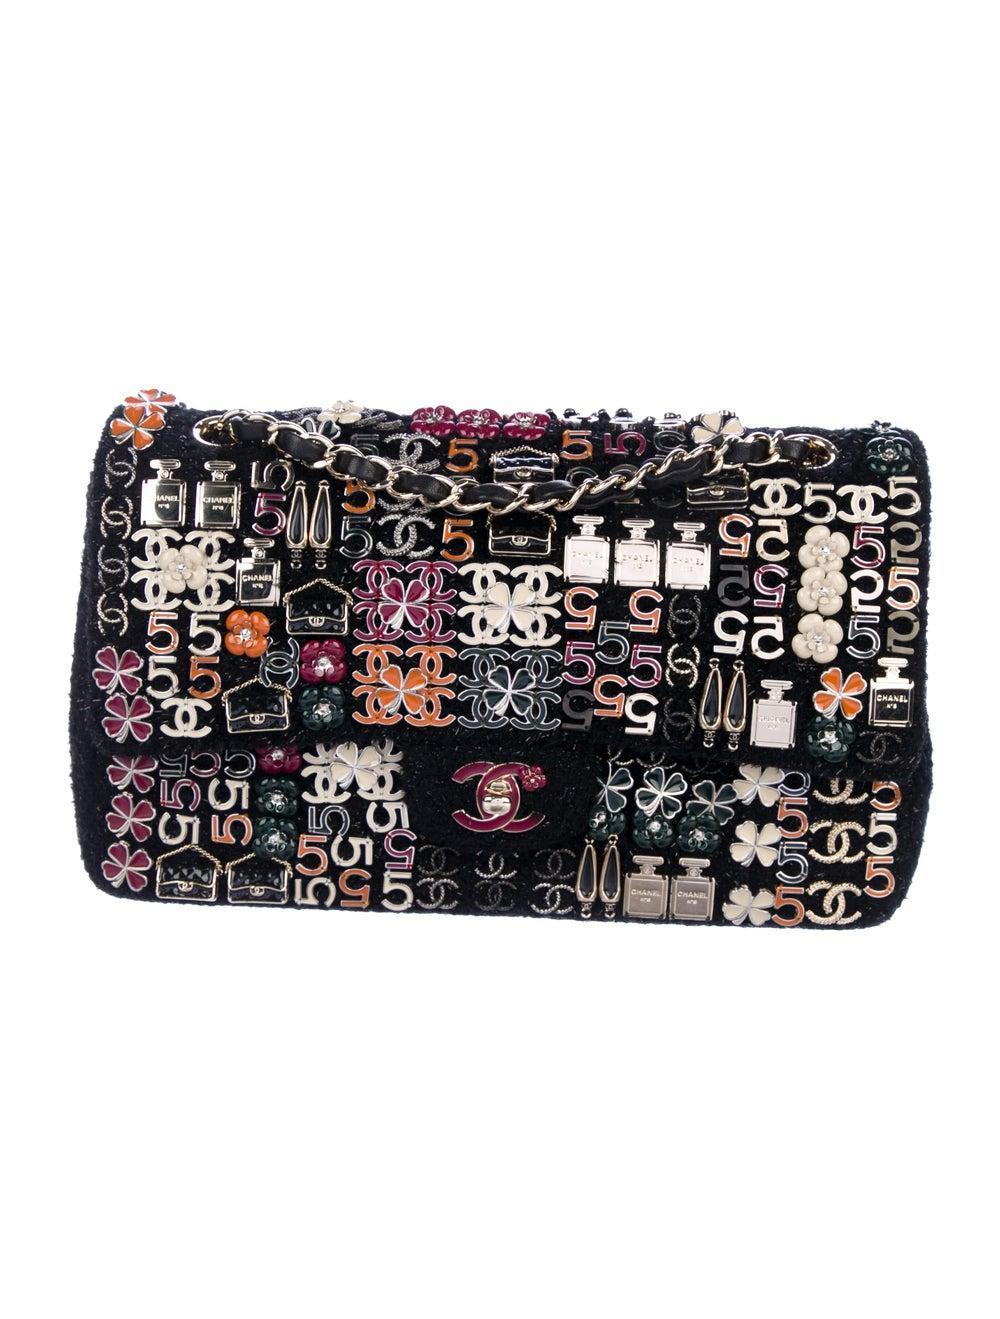 Chanel Enamel Jeweled Tweed Flap Bag Black - image 1